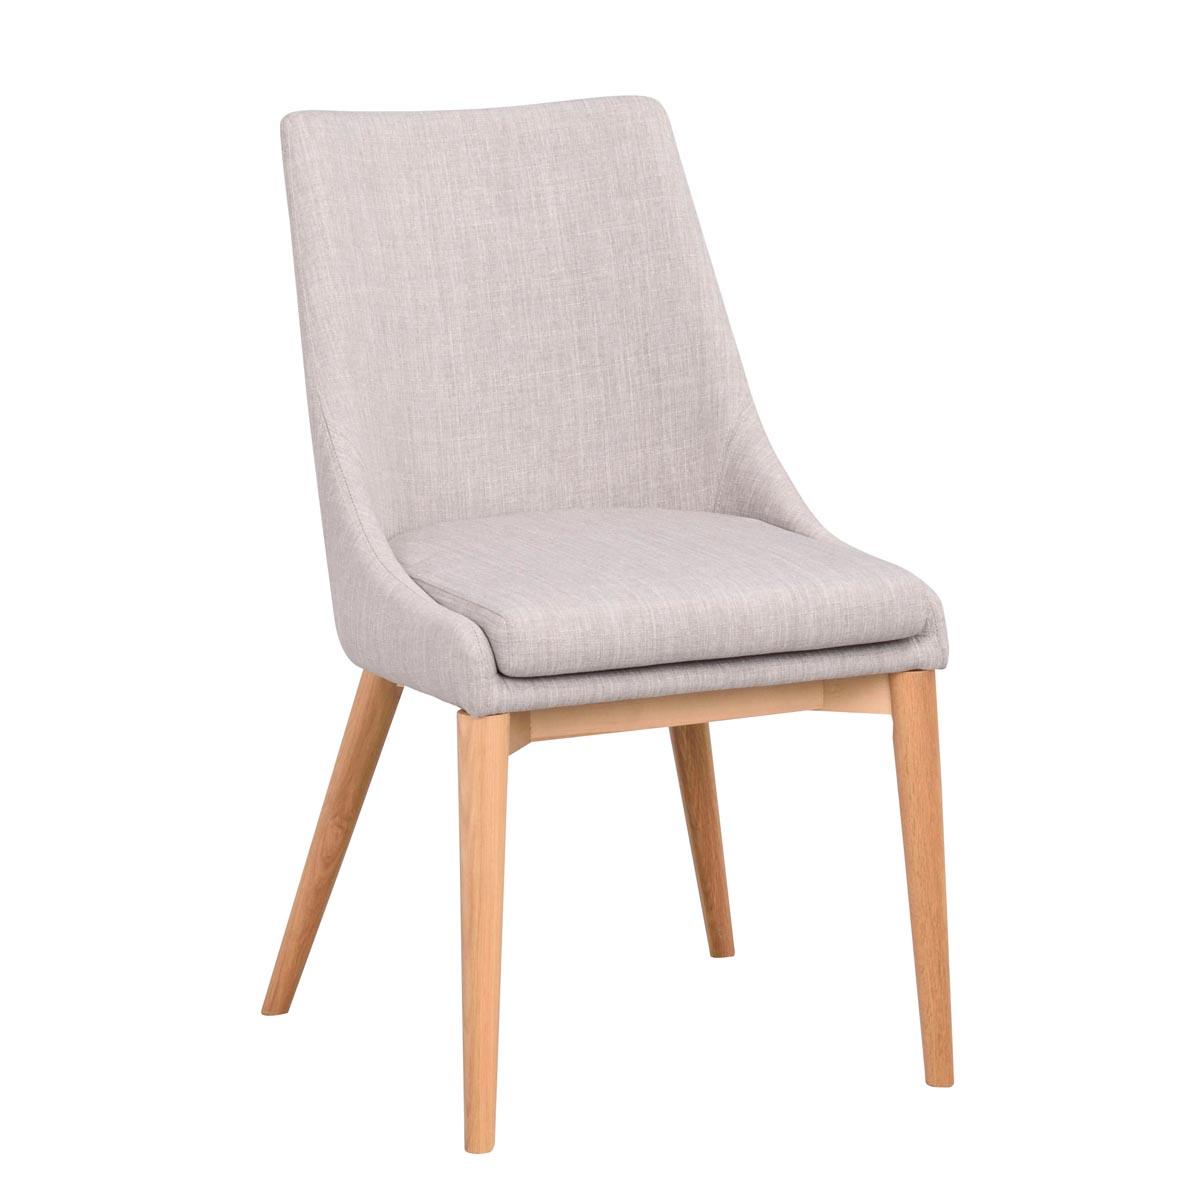 Bea-stol-ljusgrått-tyg_ek-R-118311_a